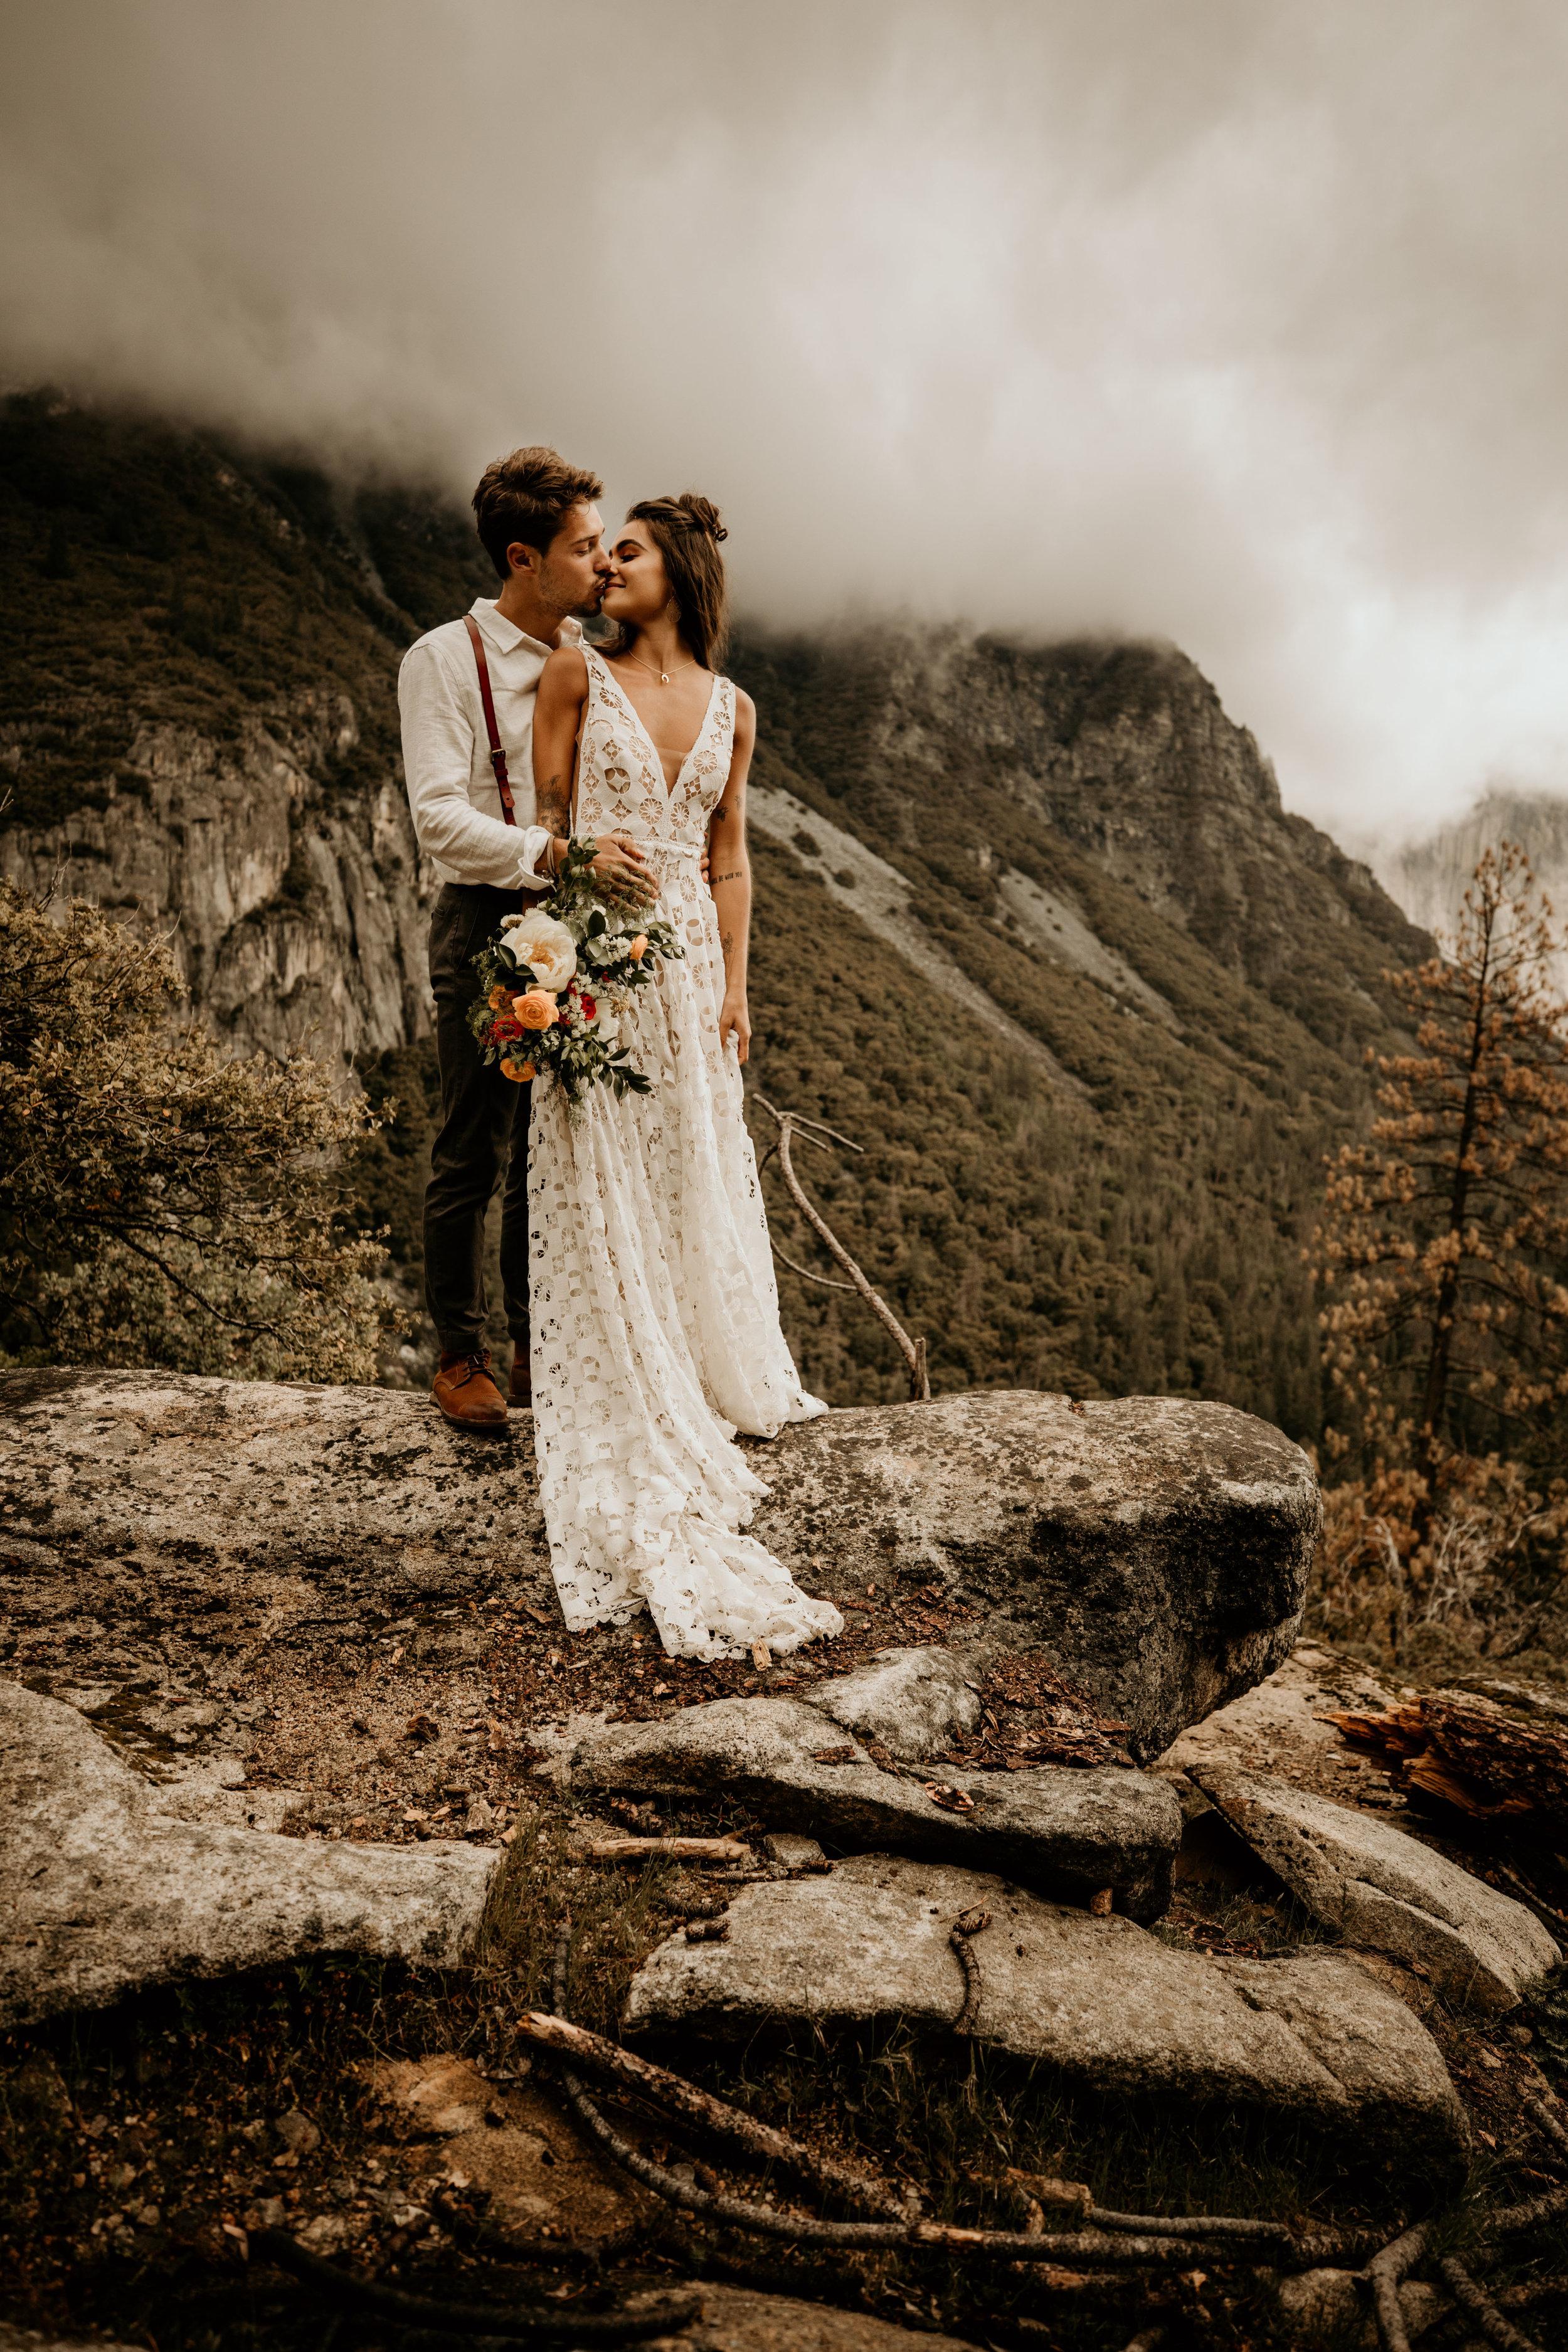 yosimite-mountain-wedding-elopement-little-rock-arkansas-photographer-erin-venable-photography-bride-engagement-1-24.jpg